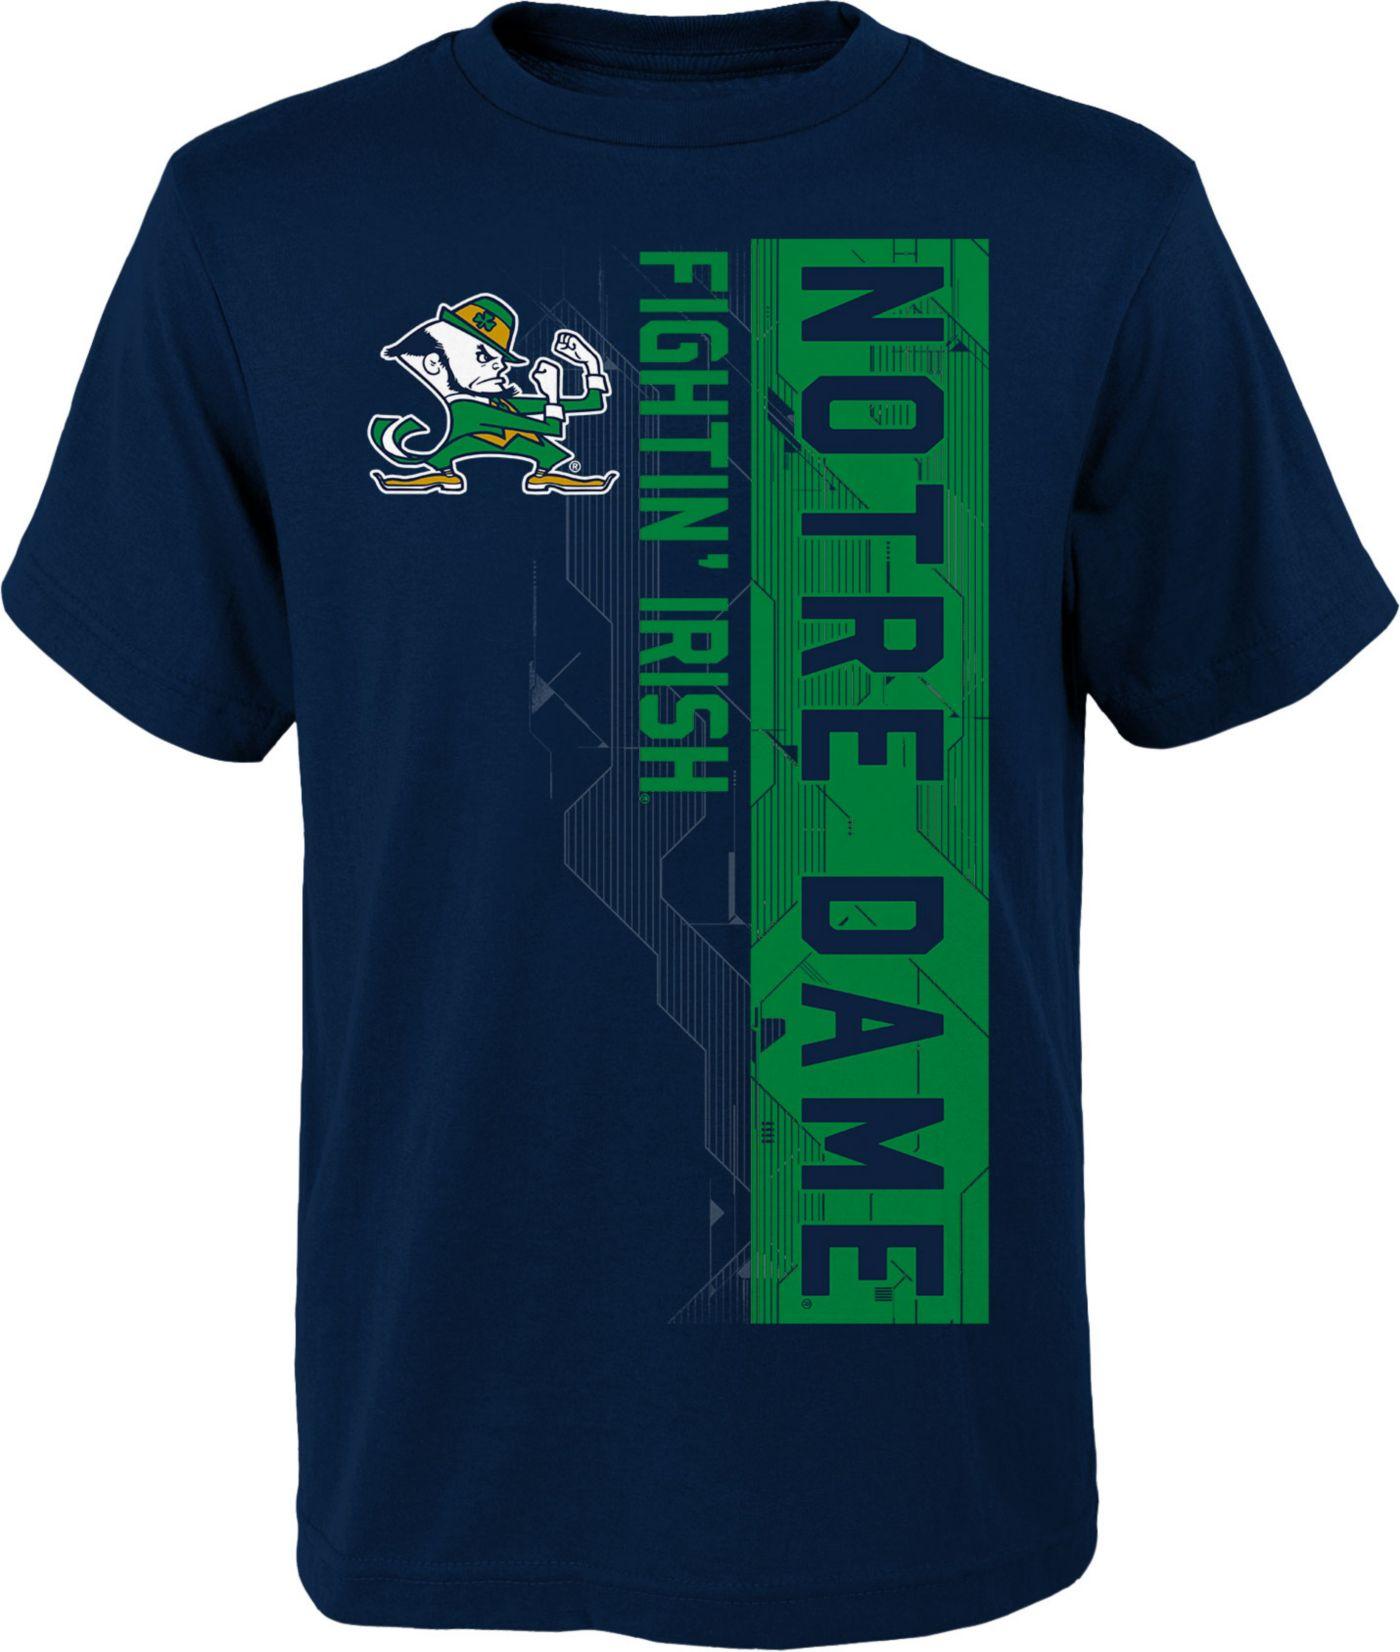 Gen2 Boys' Notre Dame Fighting Irish Navy Challenger T-Shirt